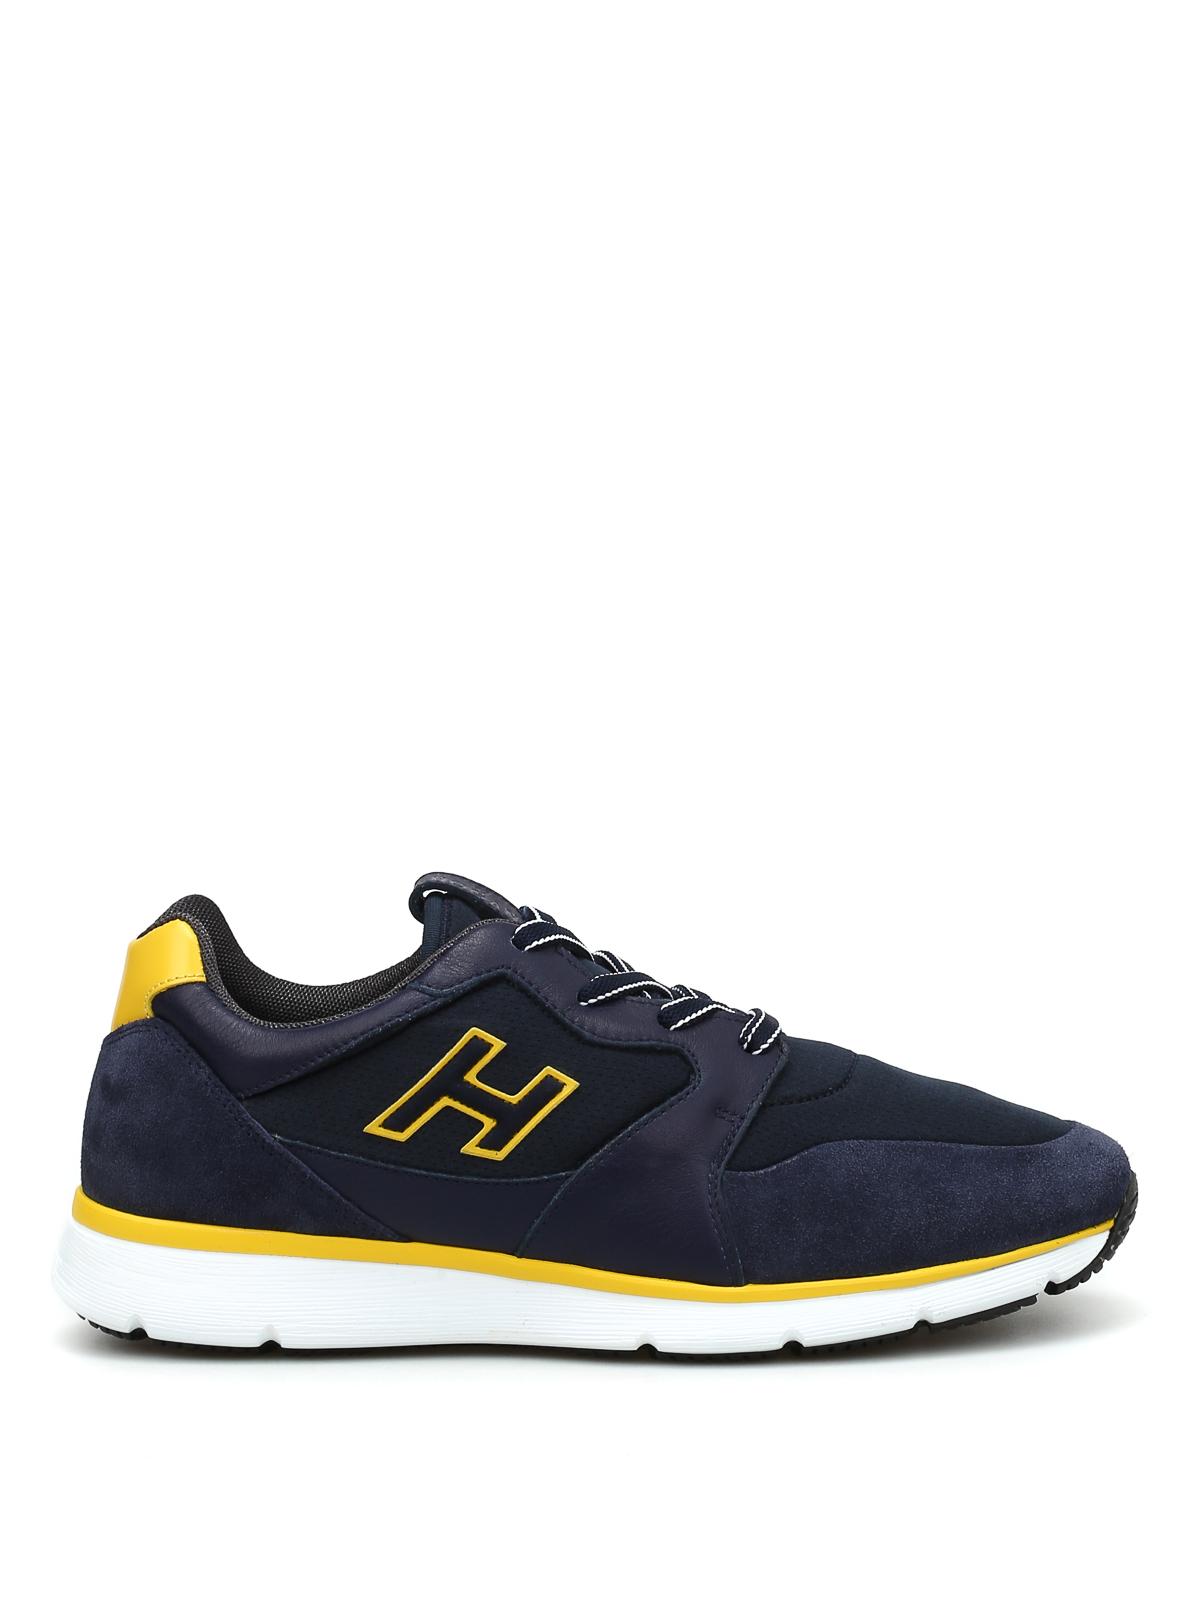 Hogan New Sneaker H Flock H254 اسپرت،اسنیکرز